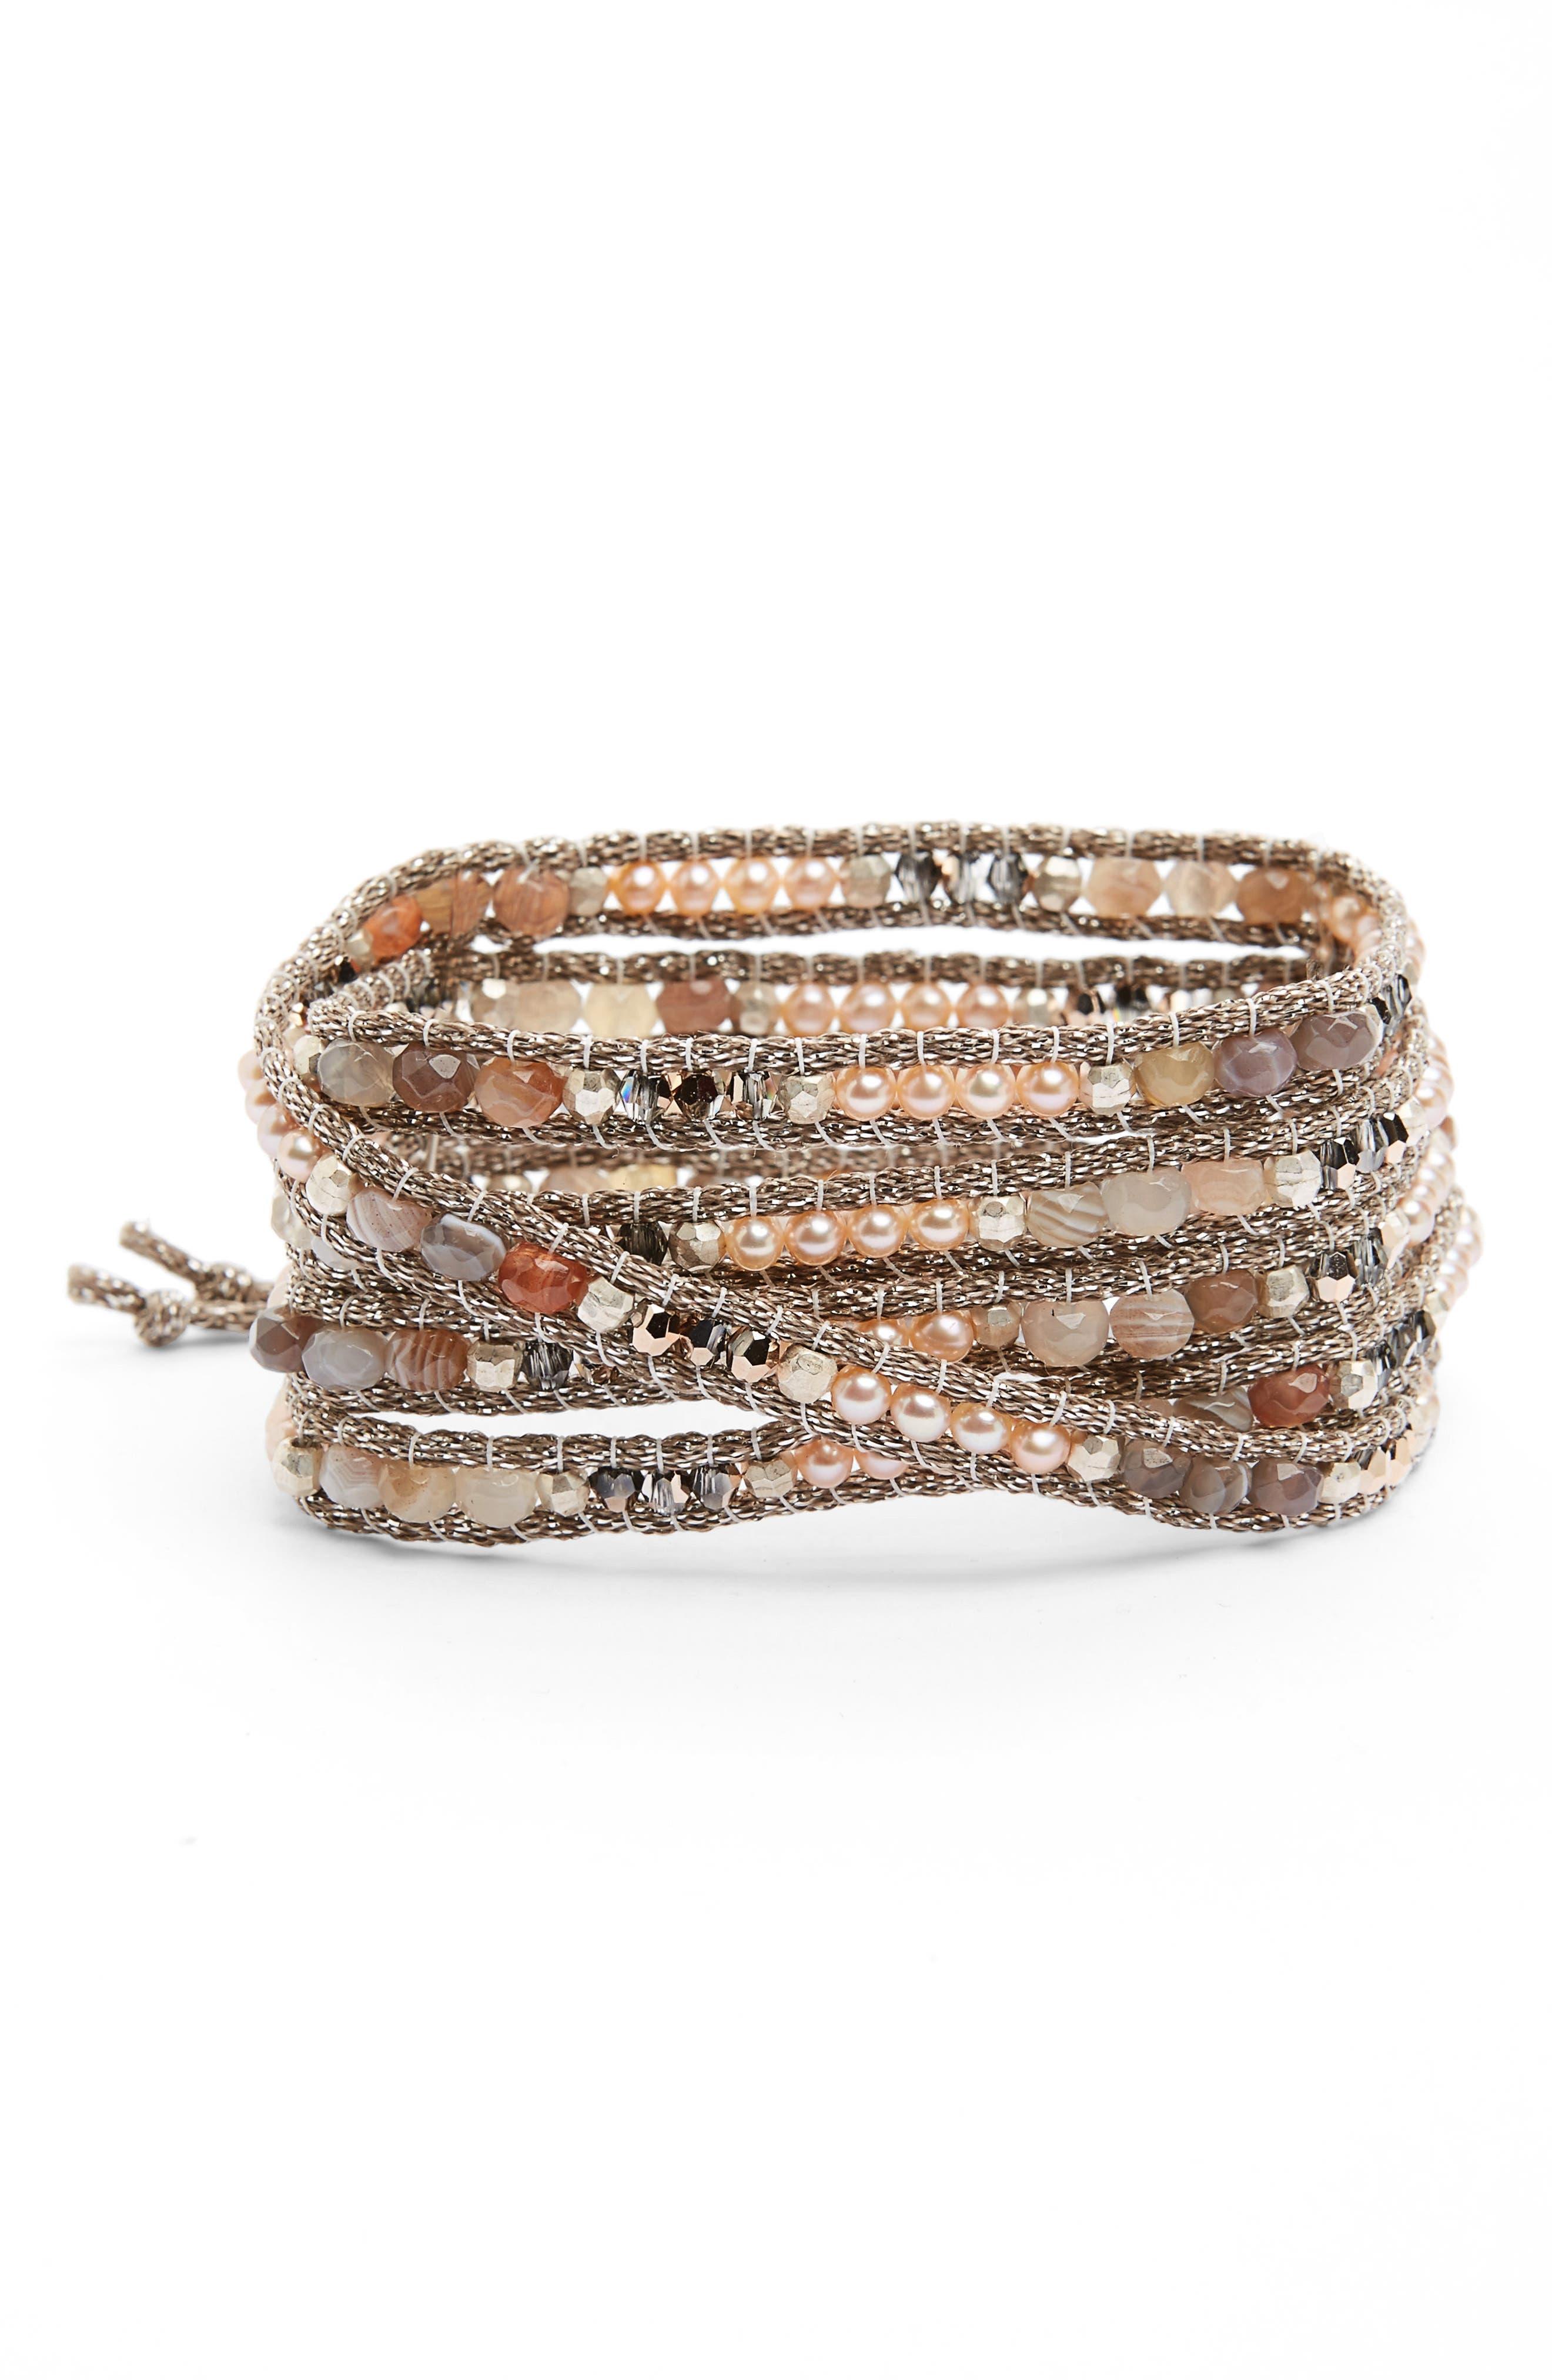 Chan Luu Agate & Freshwater Pearl Wrap Bracelet